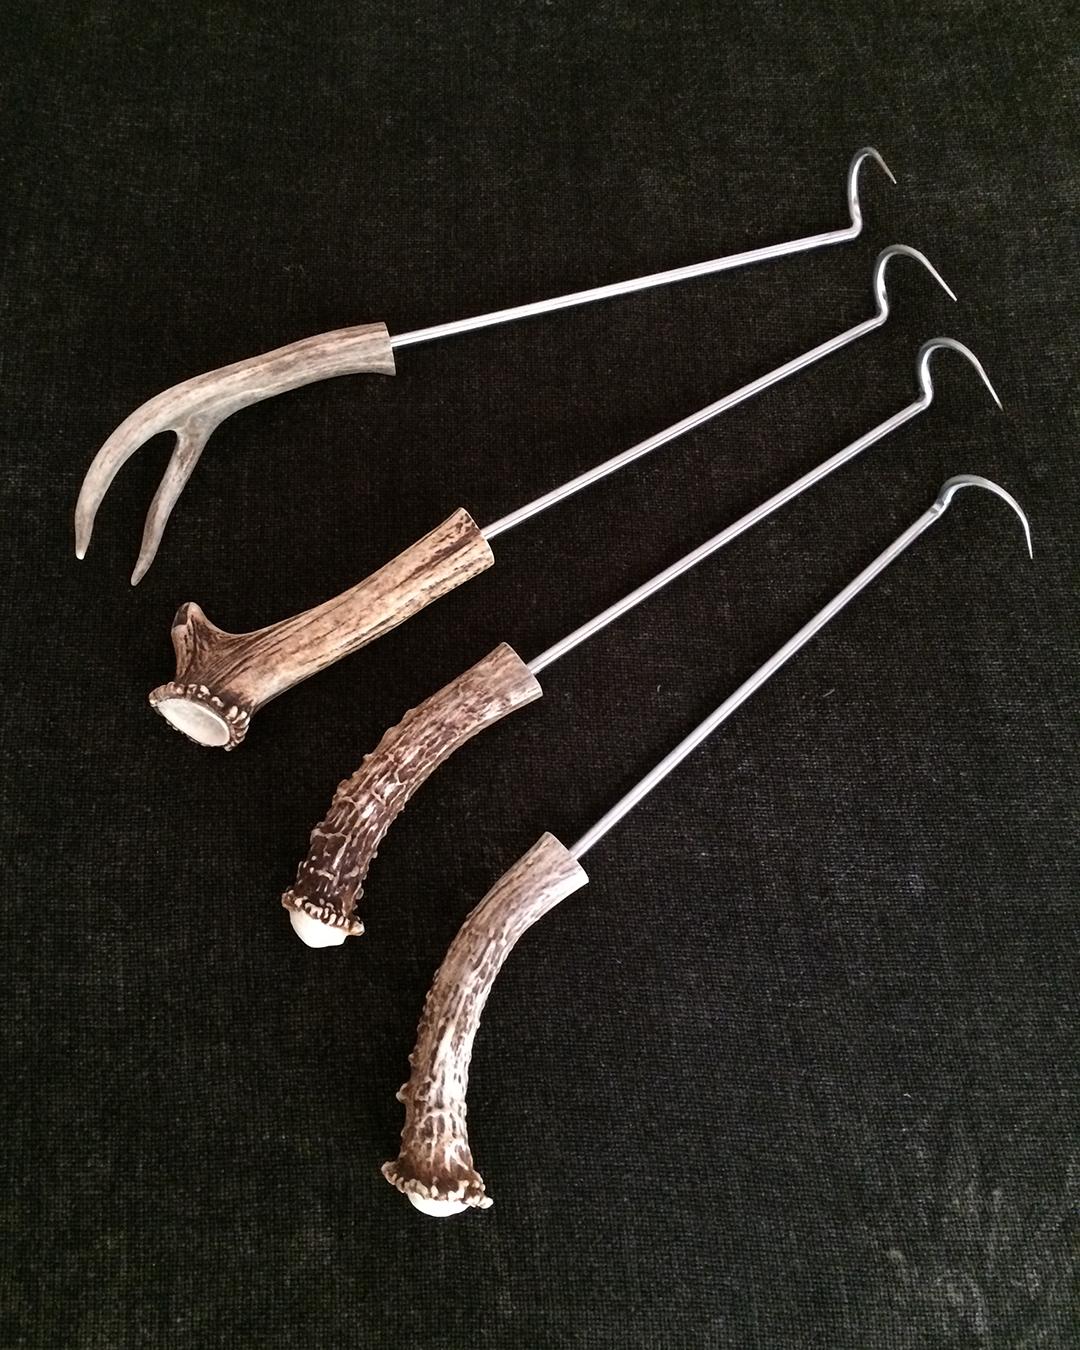 pig turners featuring responsibly harvested deer antler handles